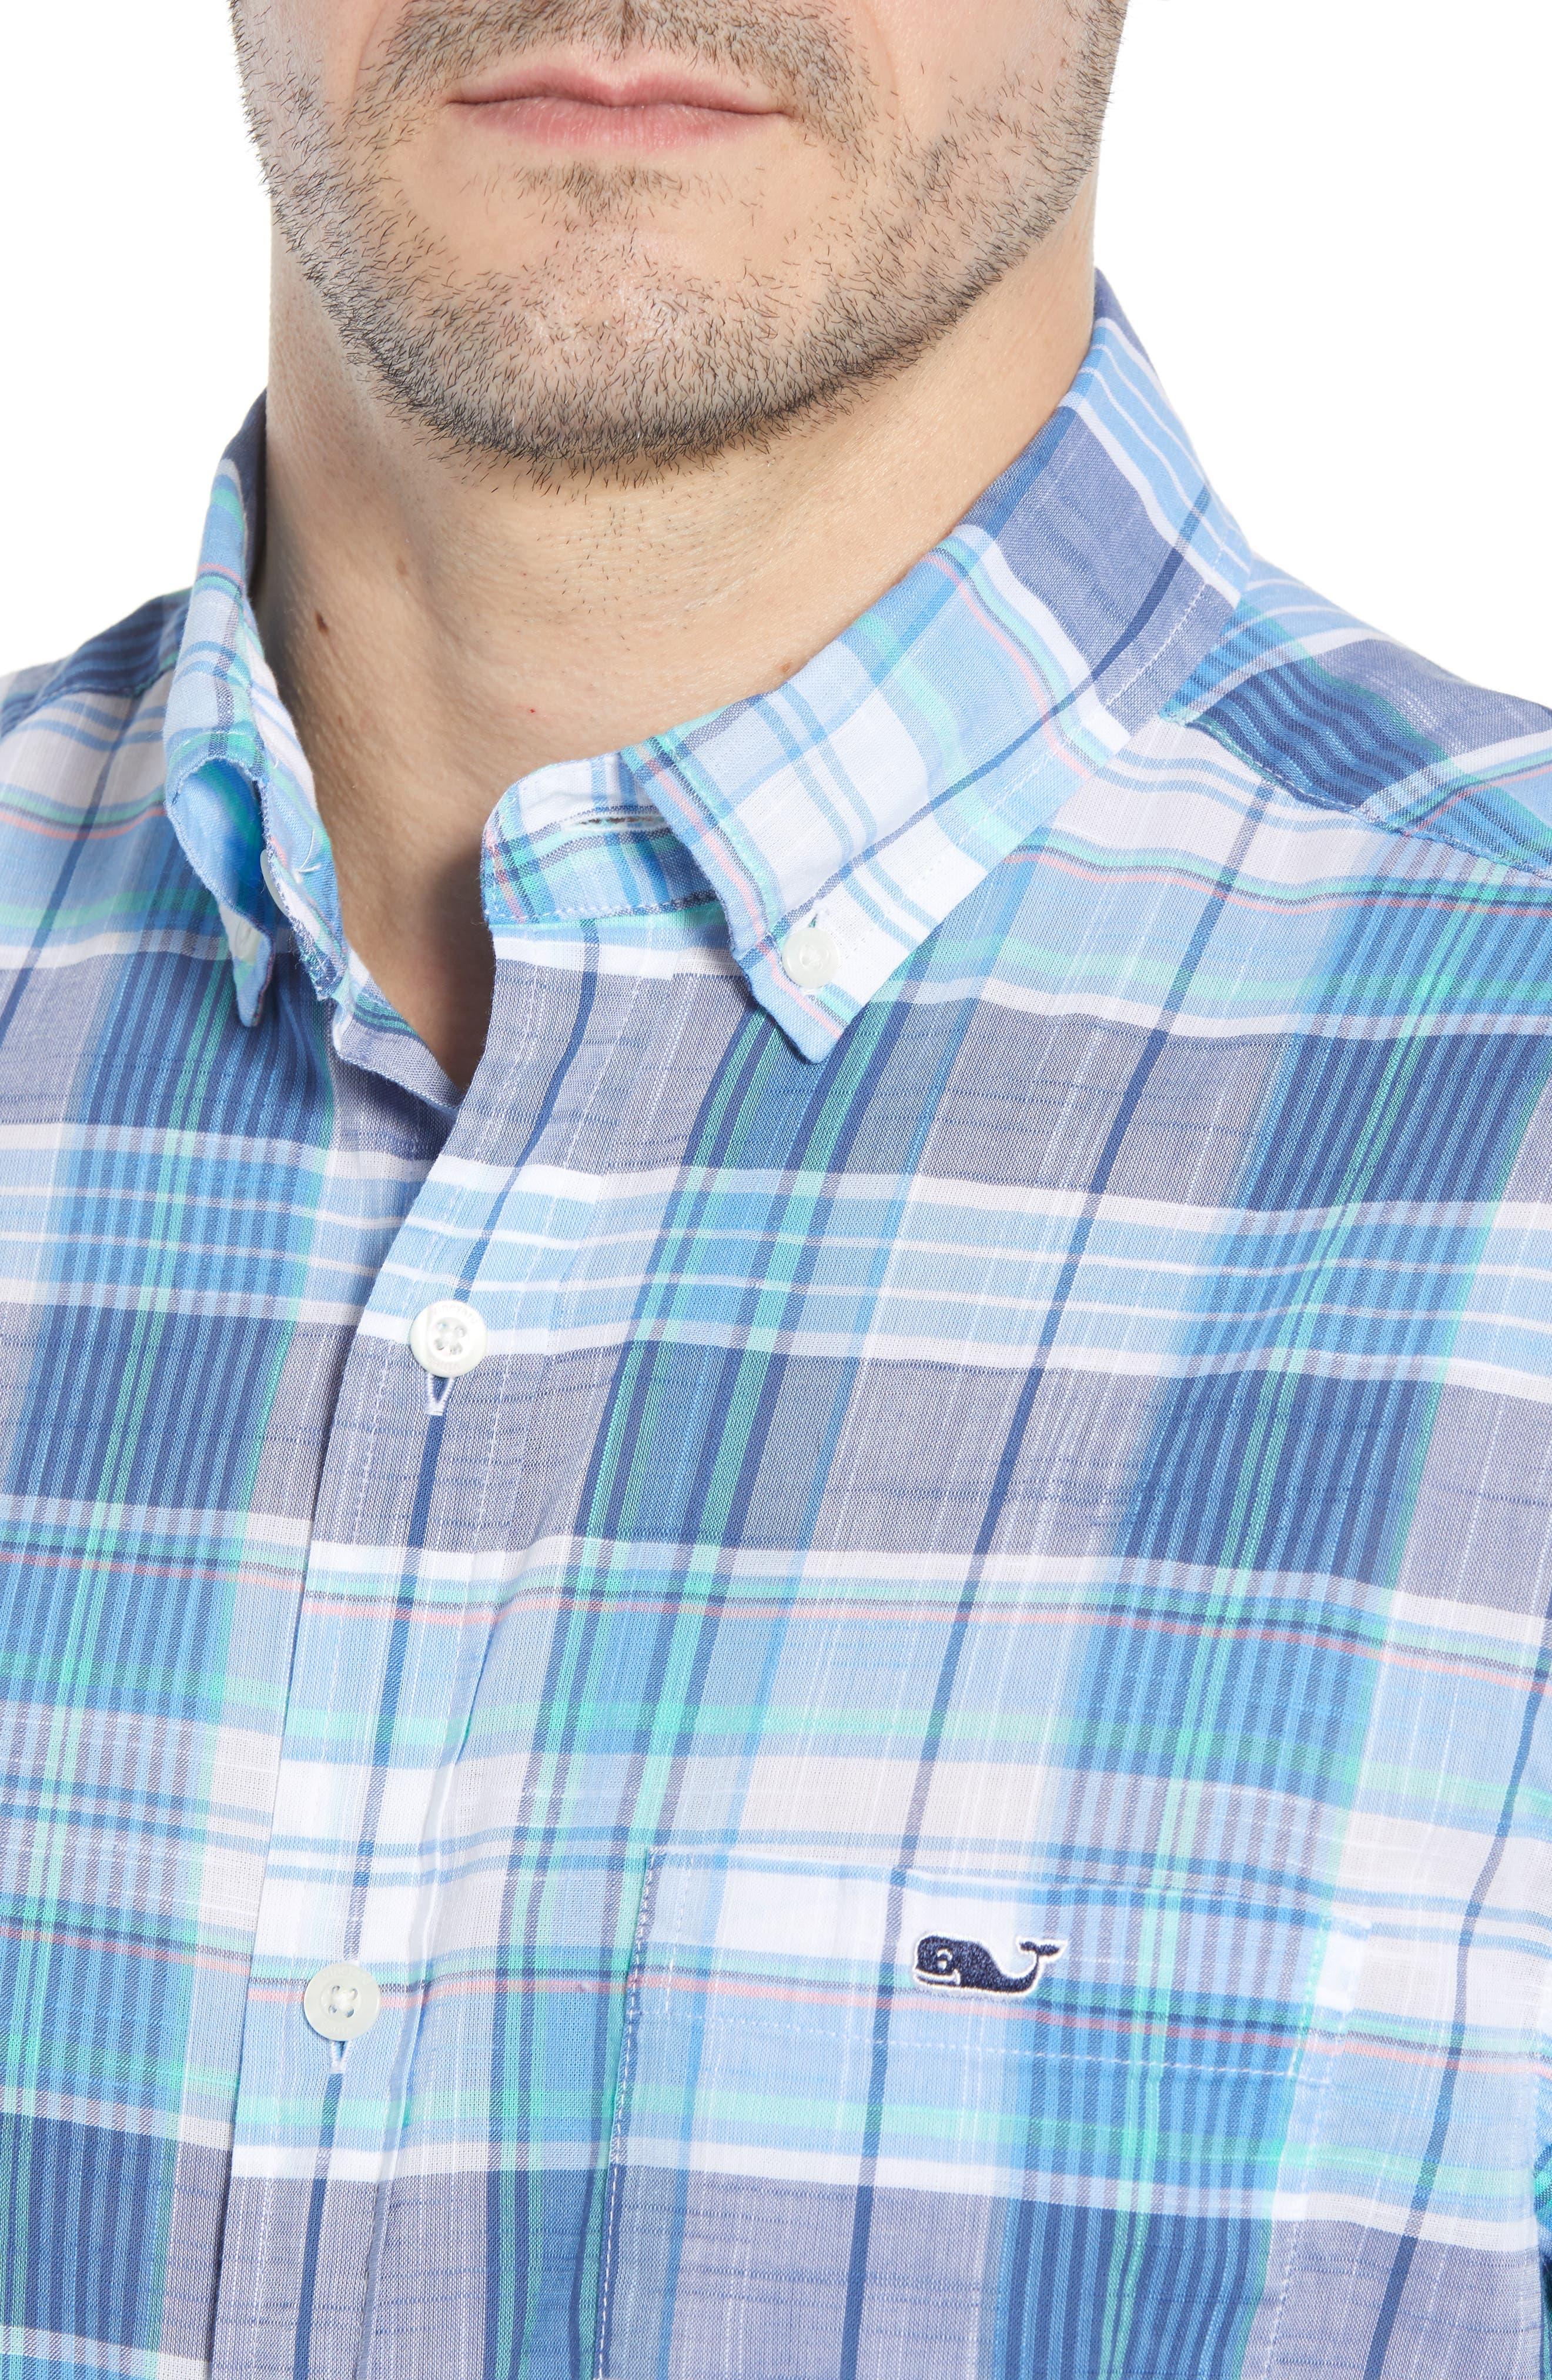 Smith Point Tucker Classic Fit Plaid Sport Shirt,                             Alternate thumbnail 5, color,                             Moonshine